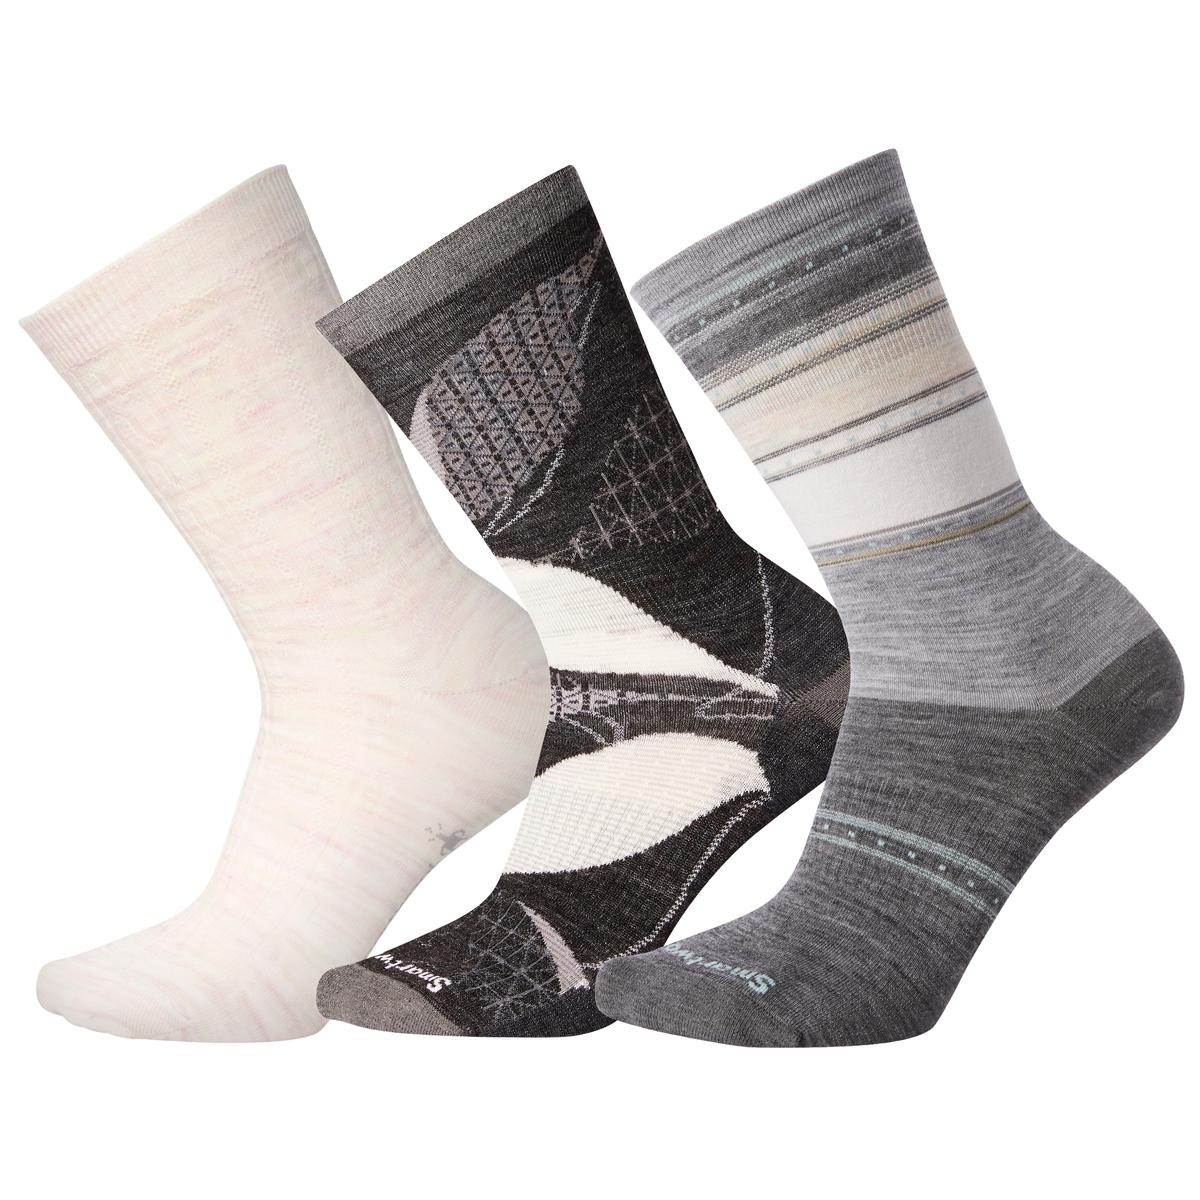 Smartwool Women's Trio 2 Socks - Various Patterns, M